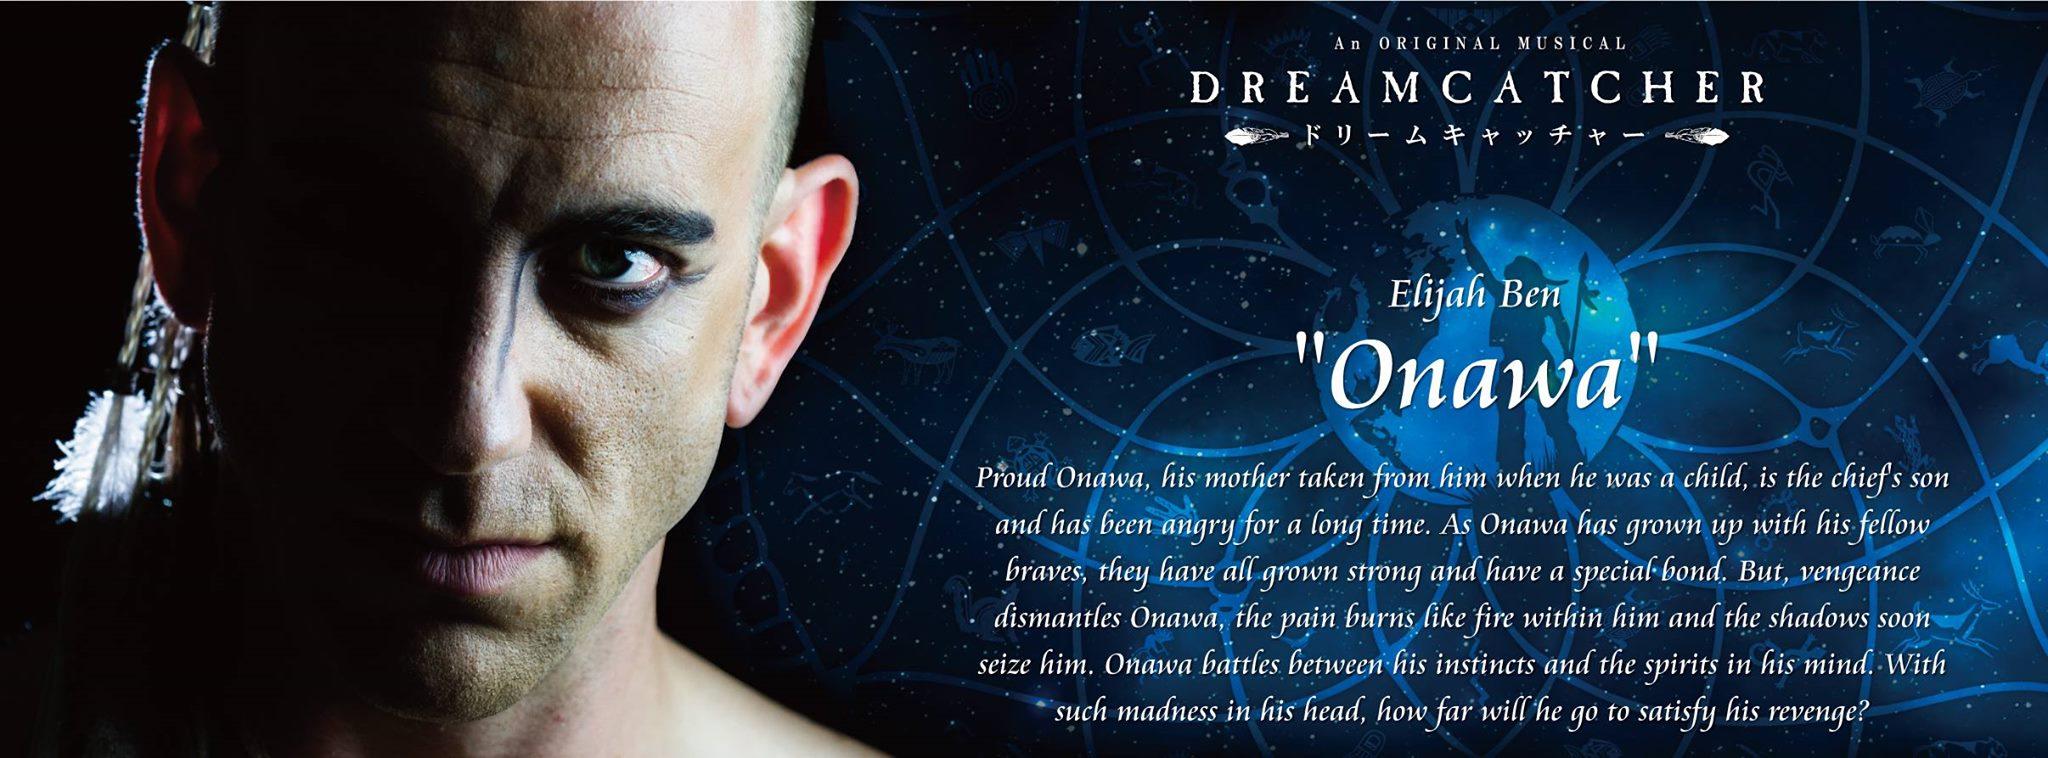 KPB Theatre Nagoya Dreamcatcher